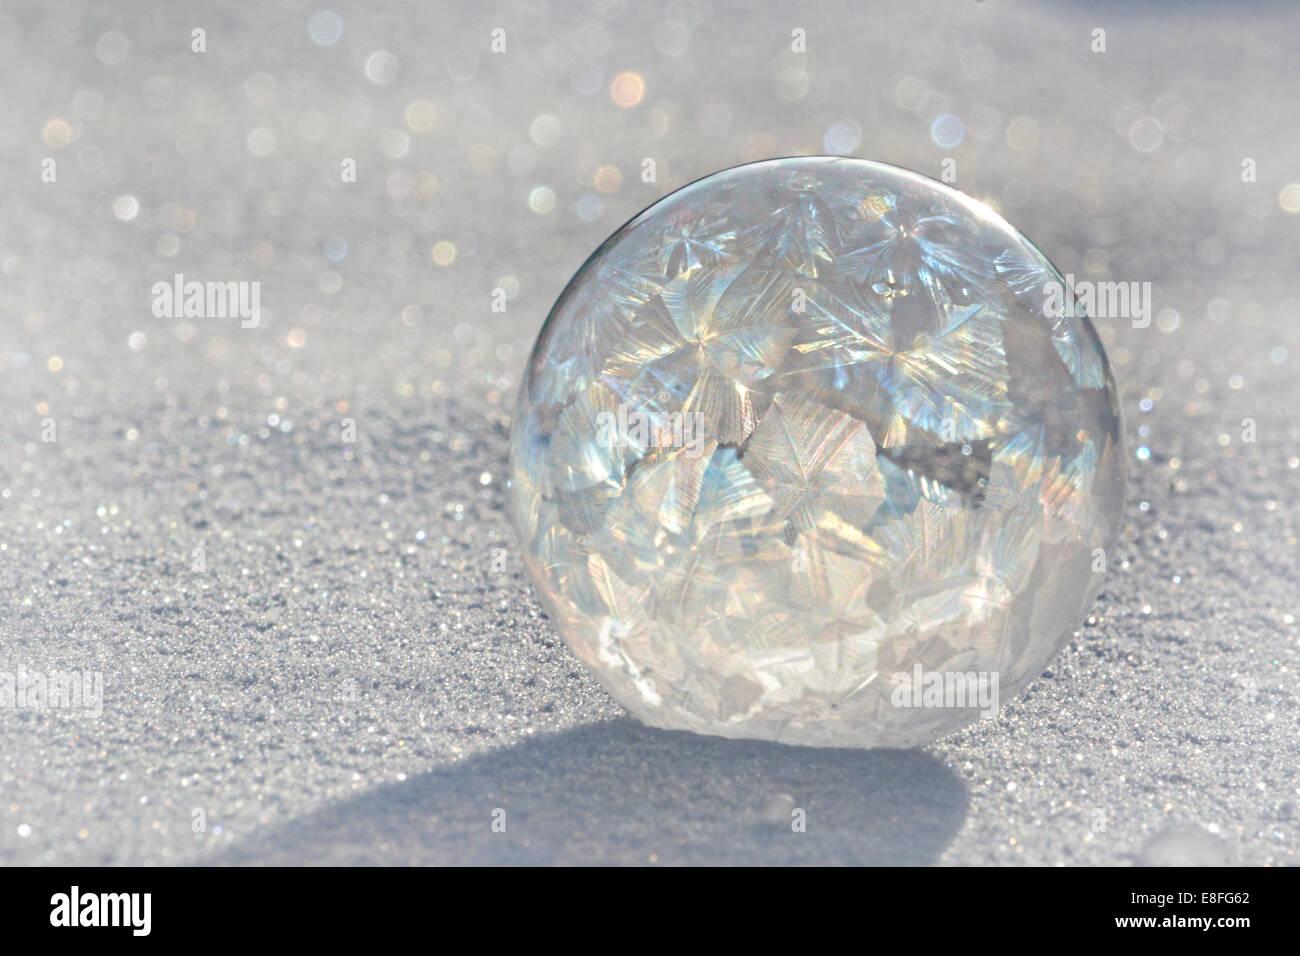 Gefrorene Seifenblase auf Eis Stockbild